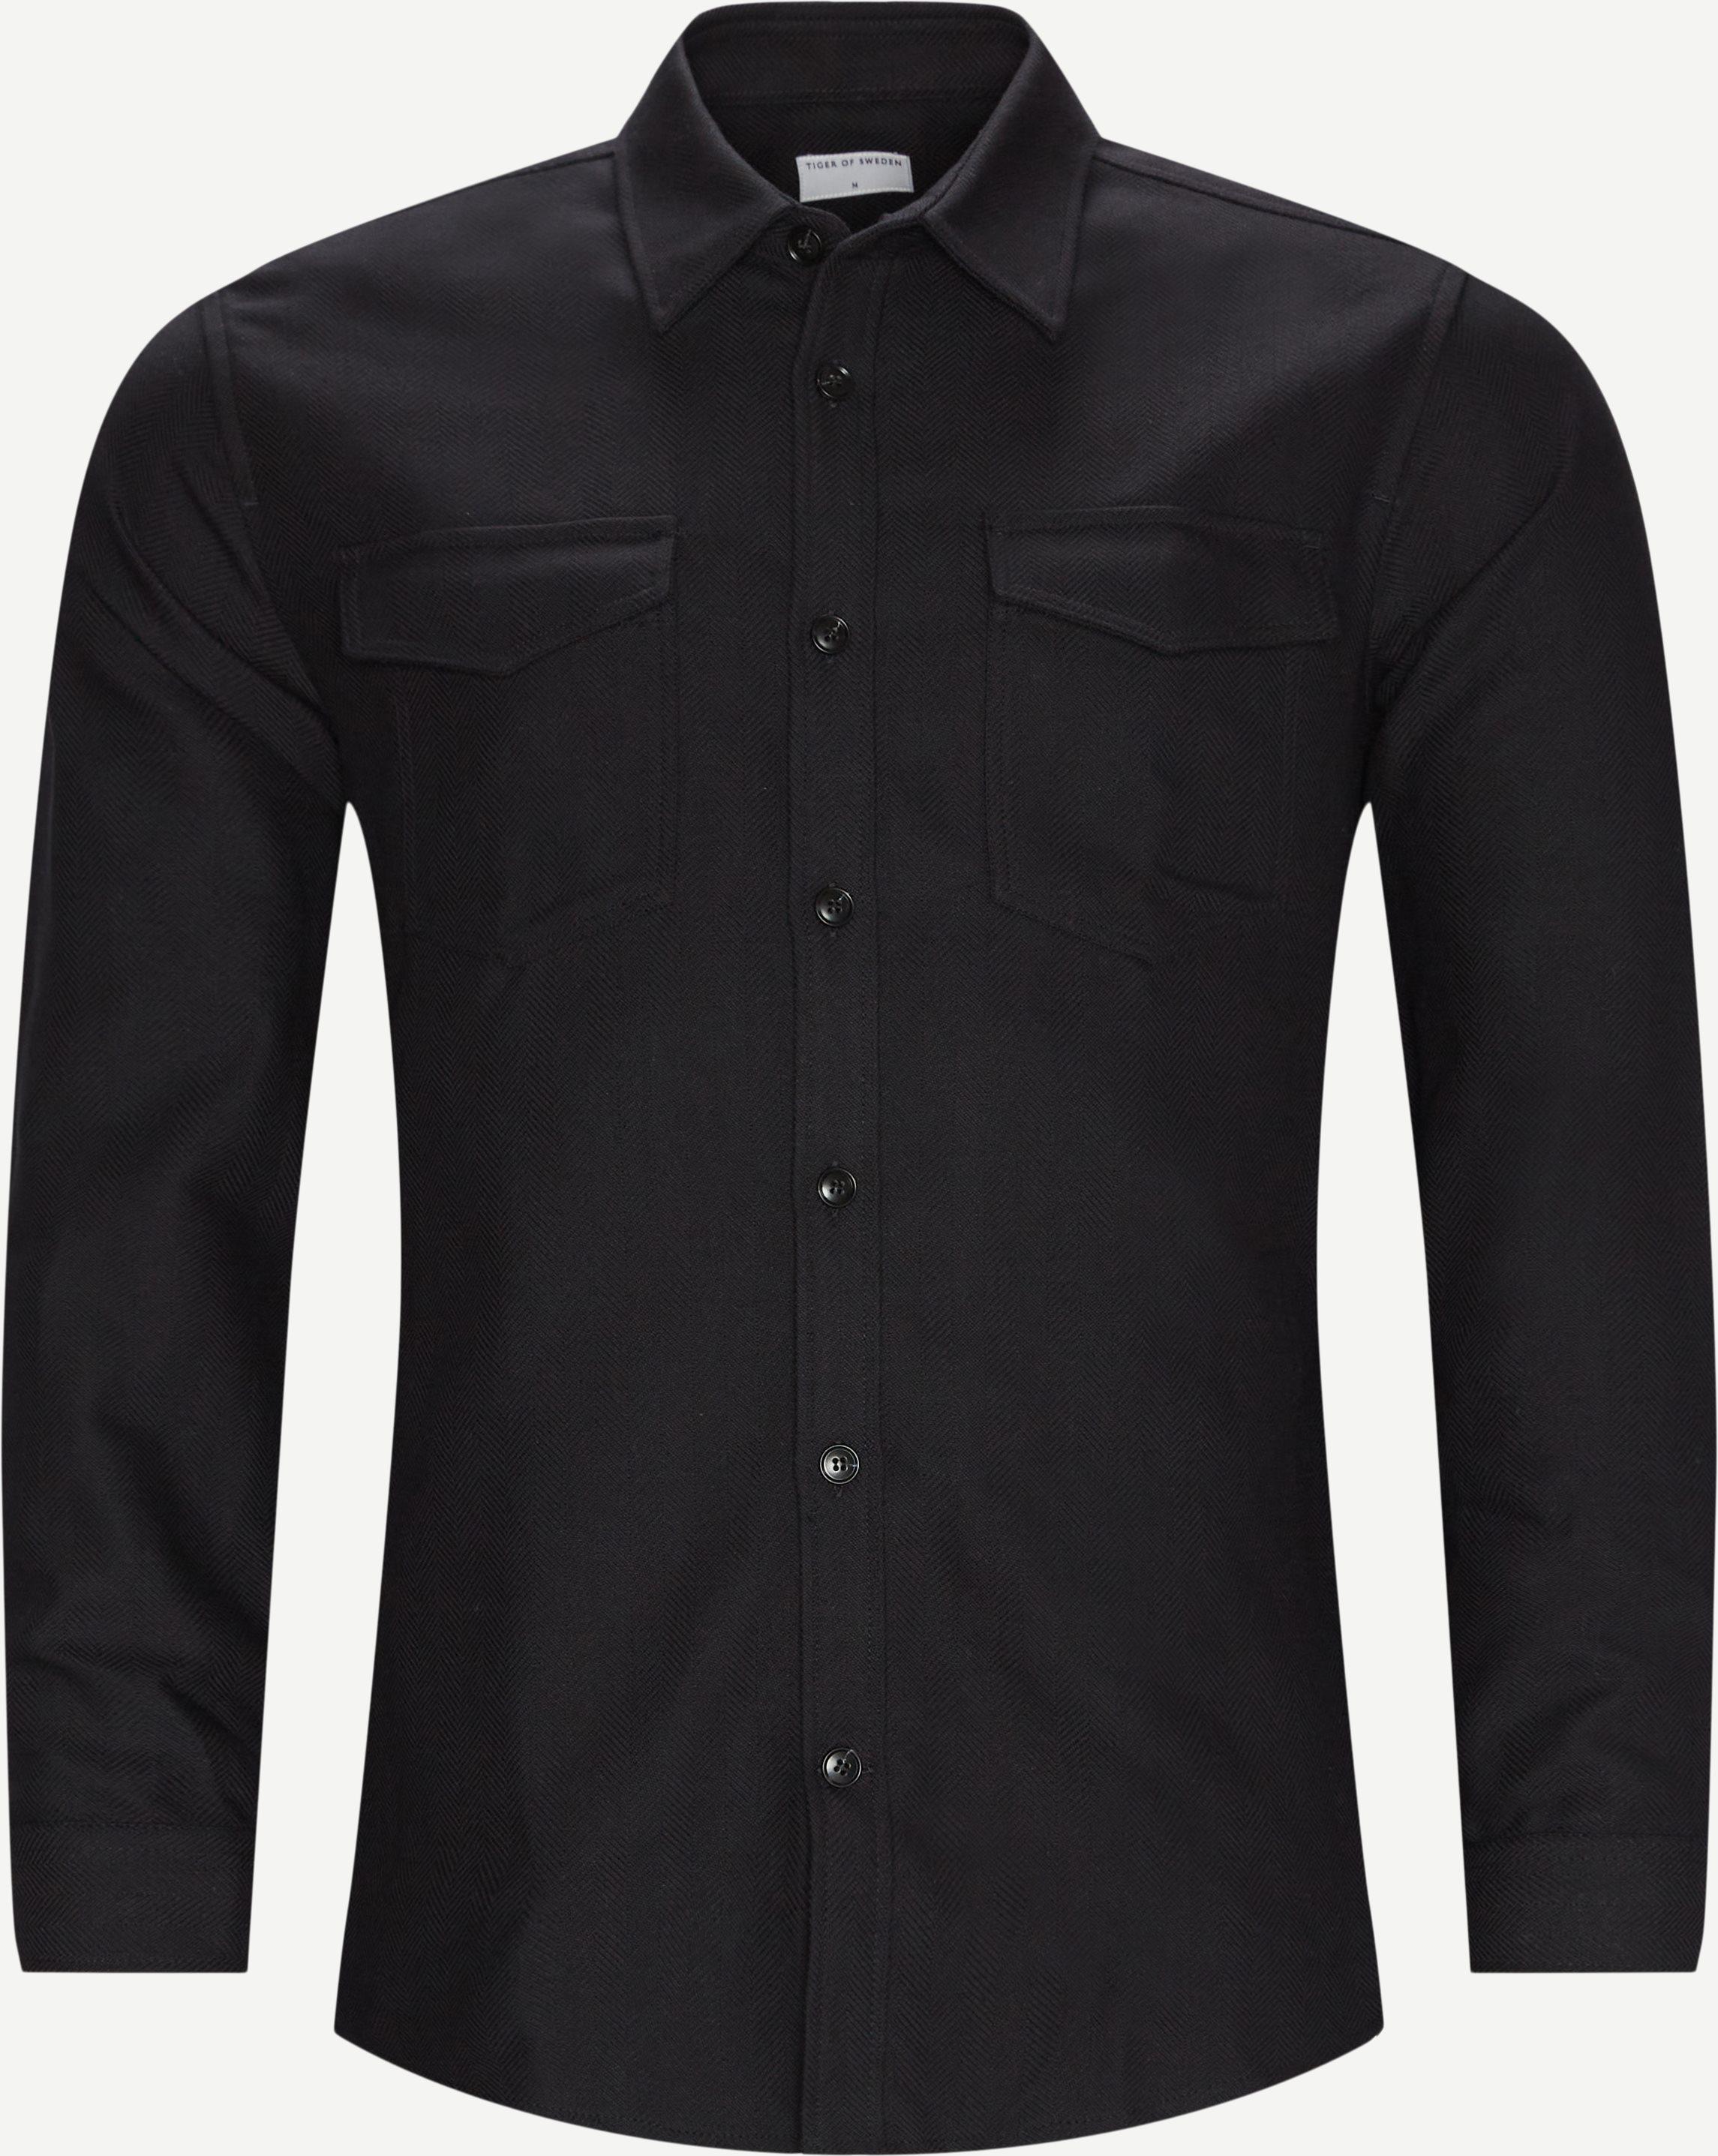 69391 Arnou Overshirt - Overshirts - Regular fit - Sort